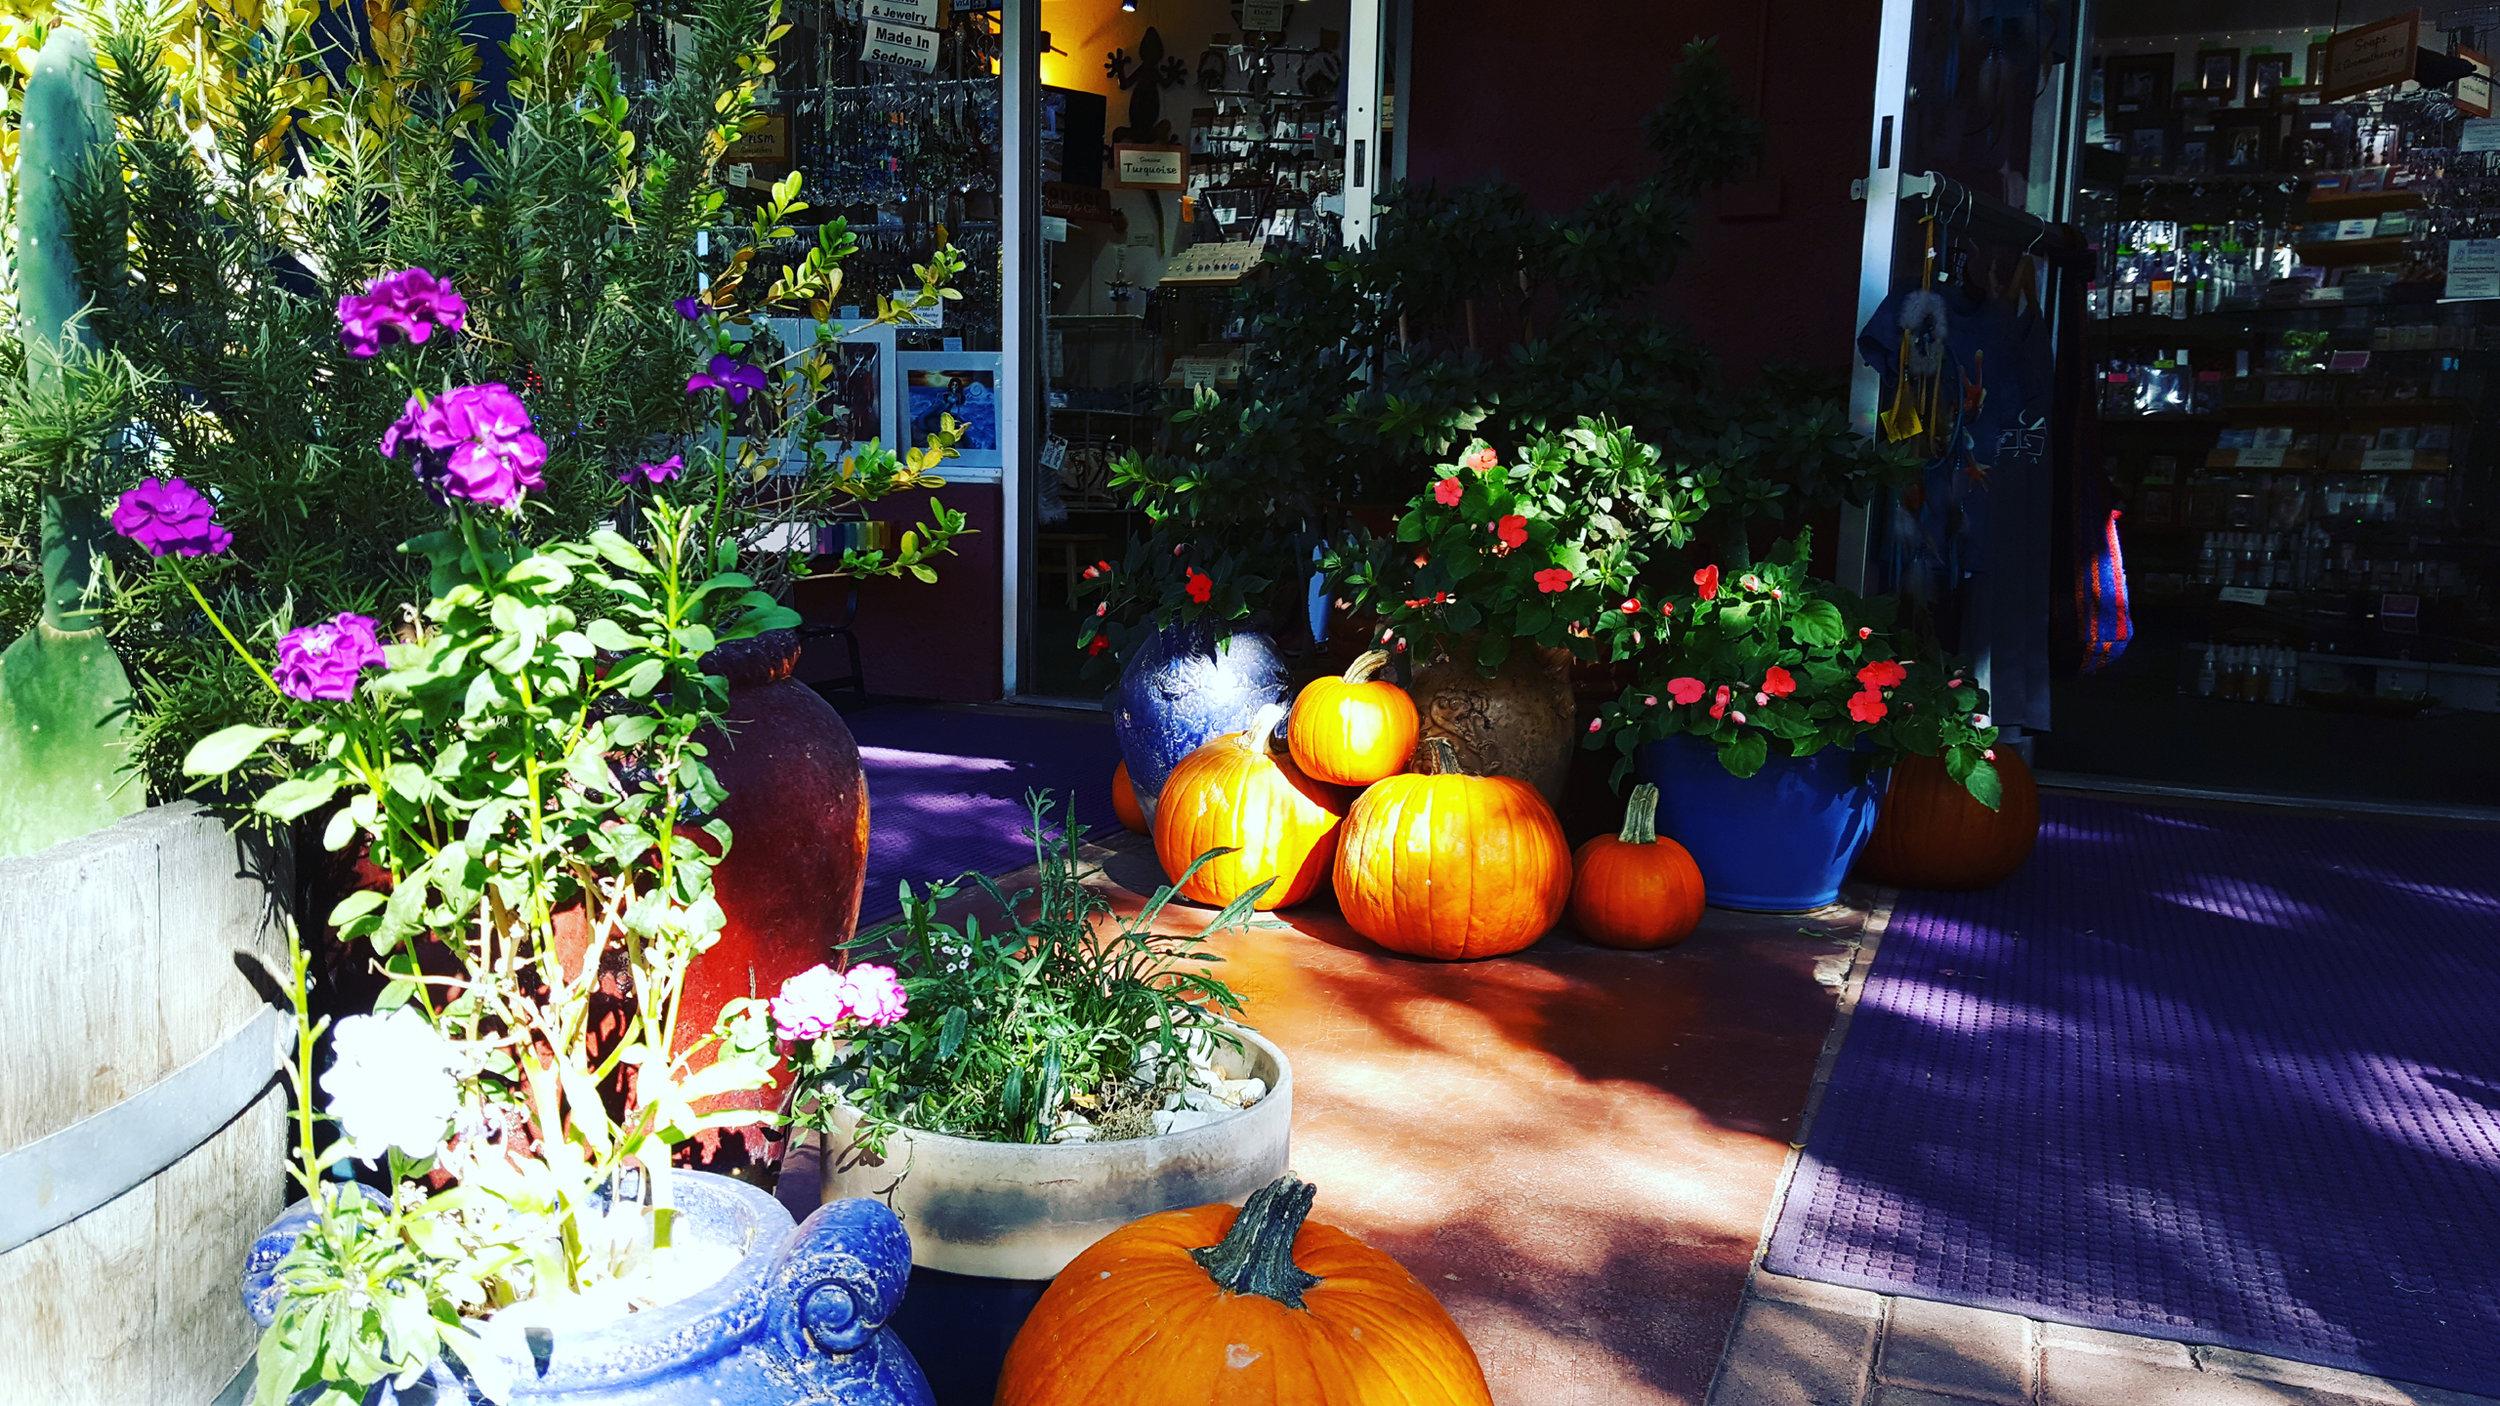 Pumpkins_Sedona_Oct_10_17.jpg